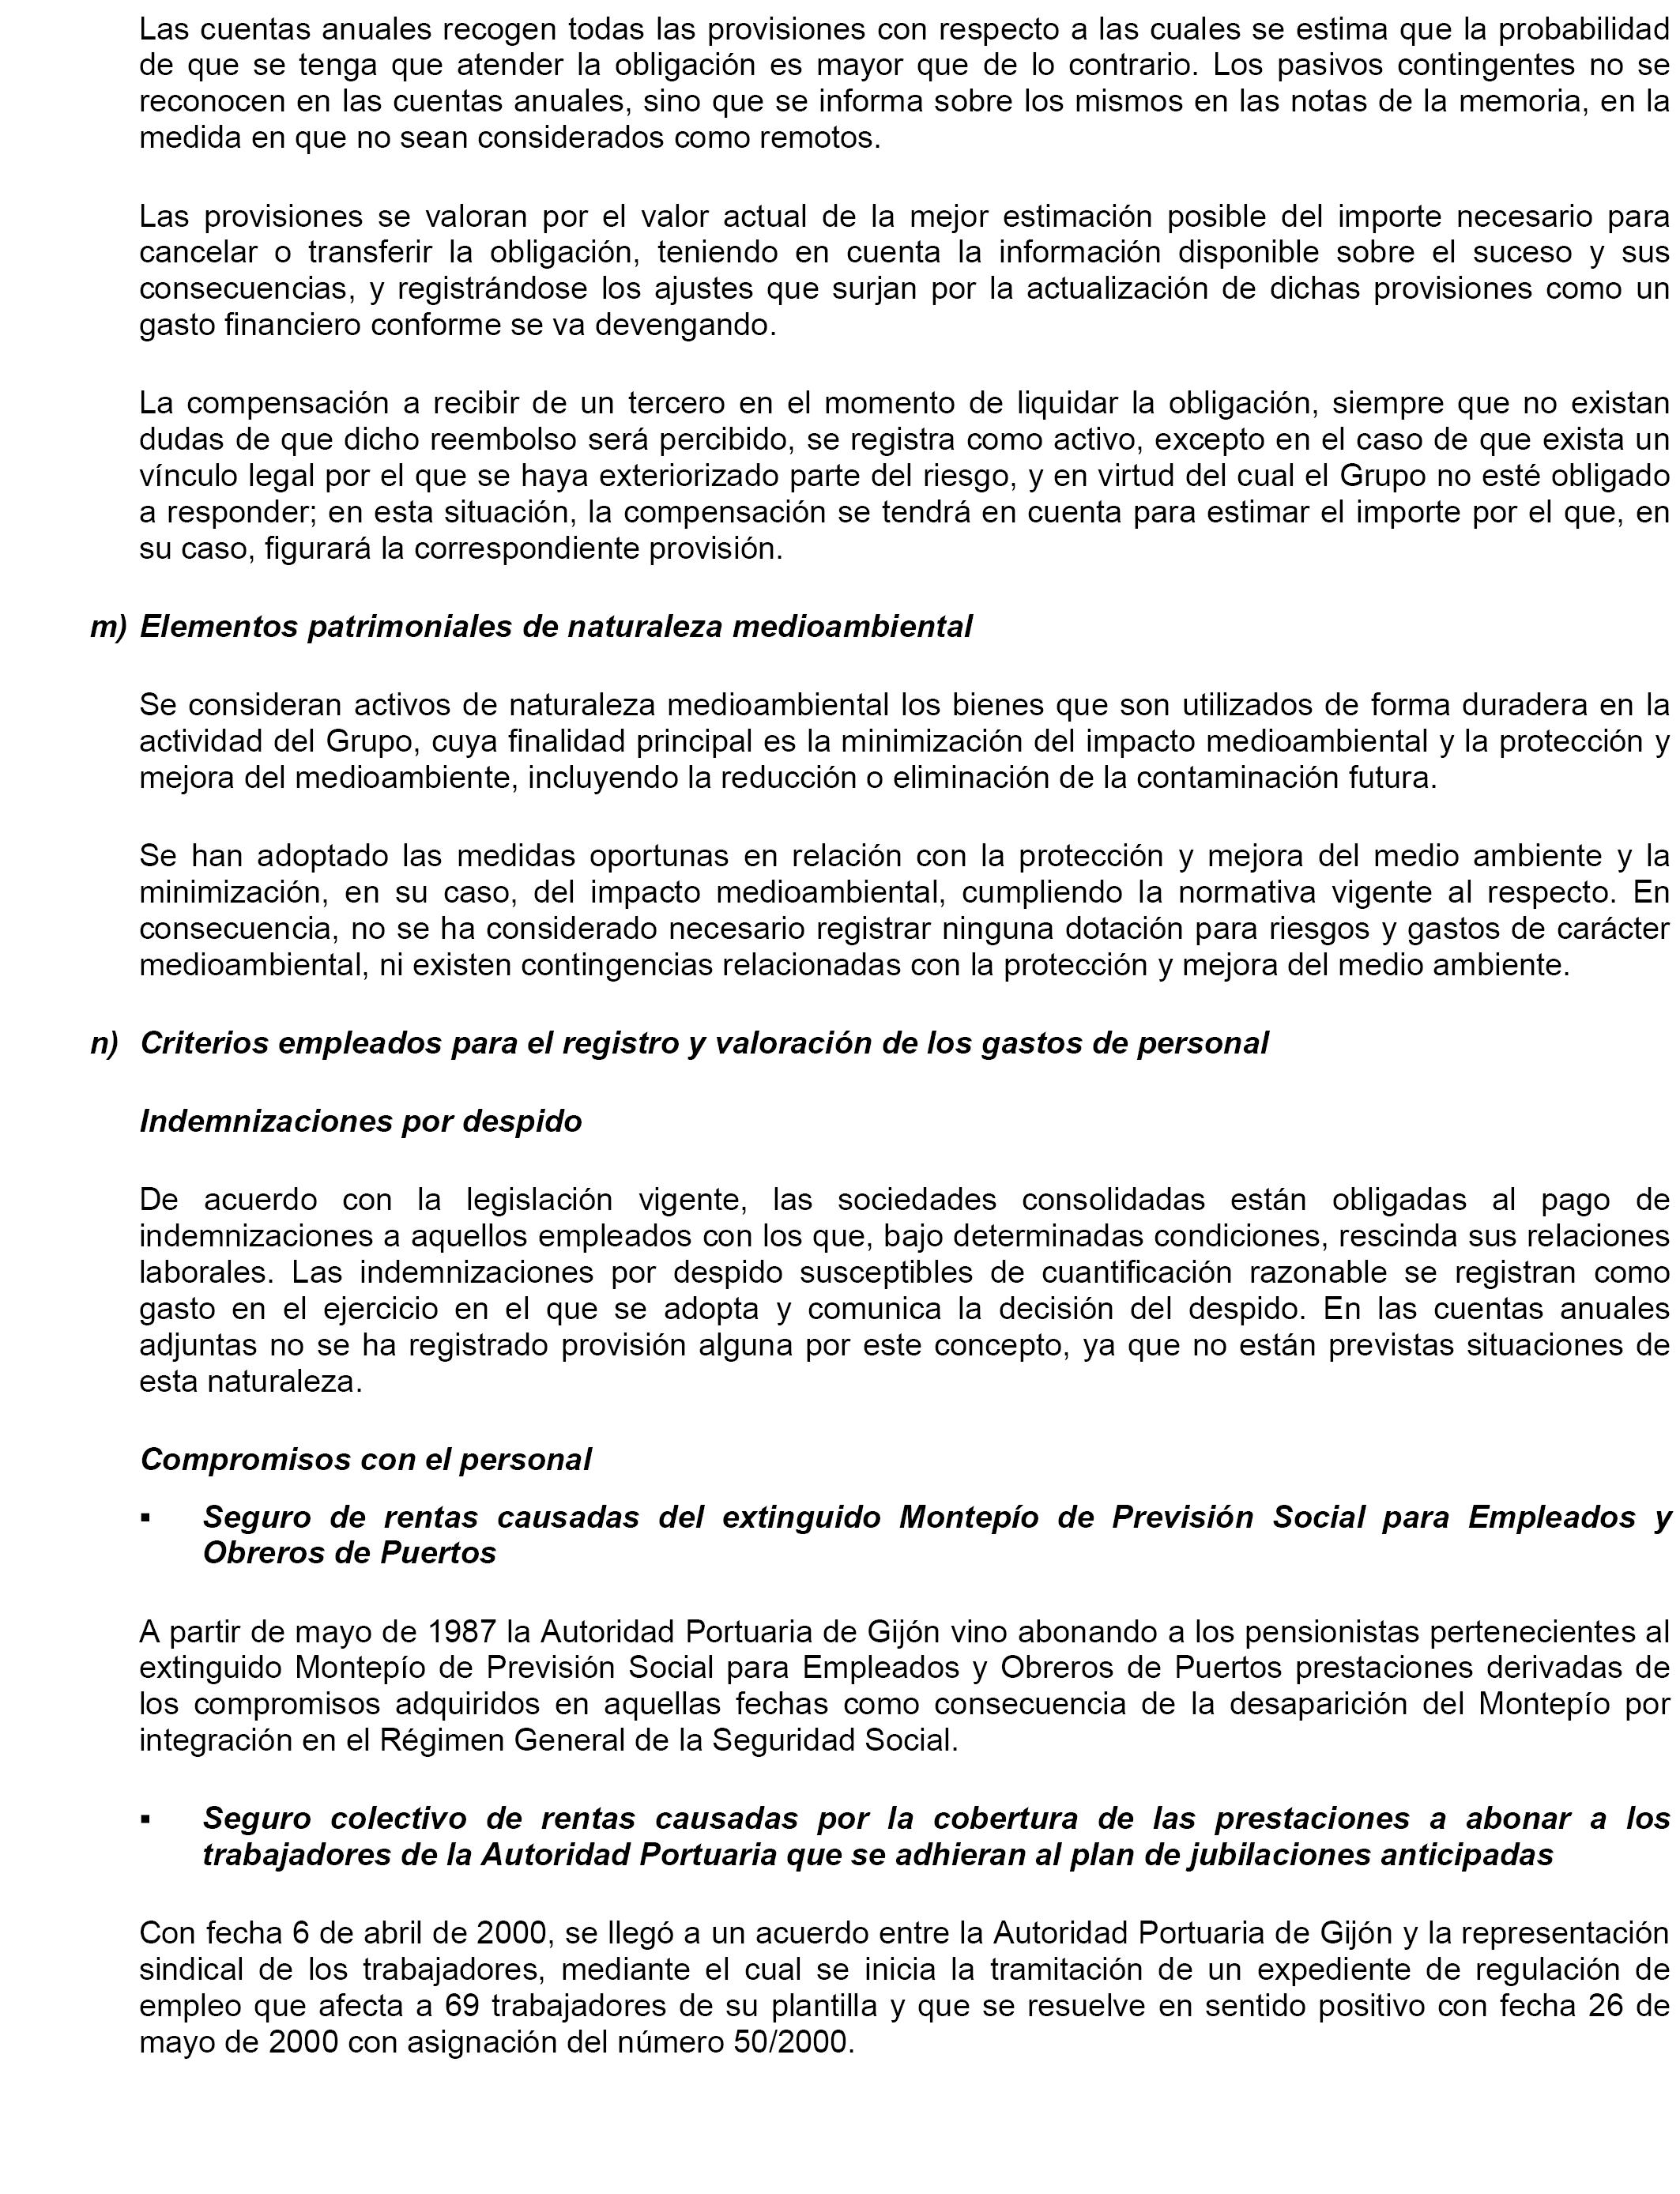 BOE.es - Documento BOE-A-2017-10180